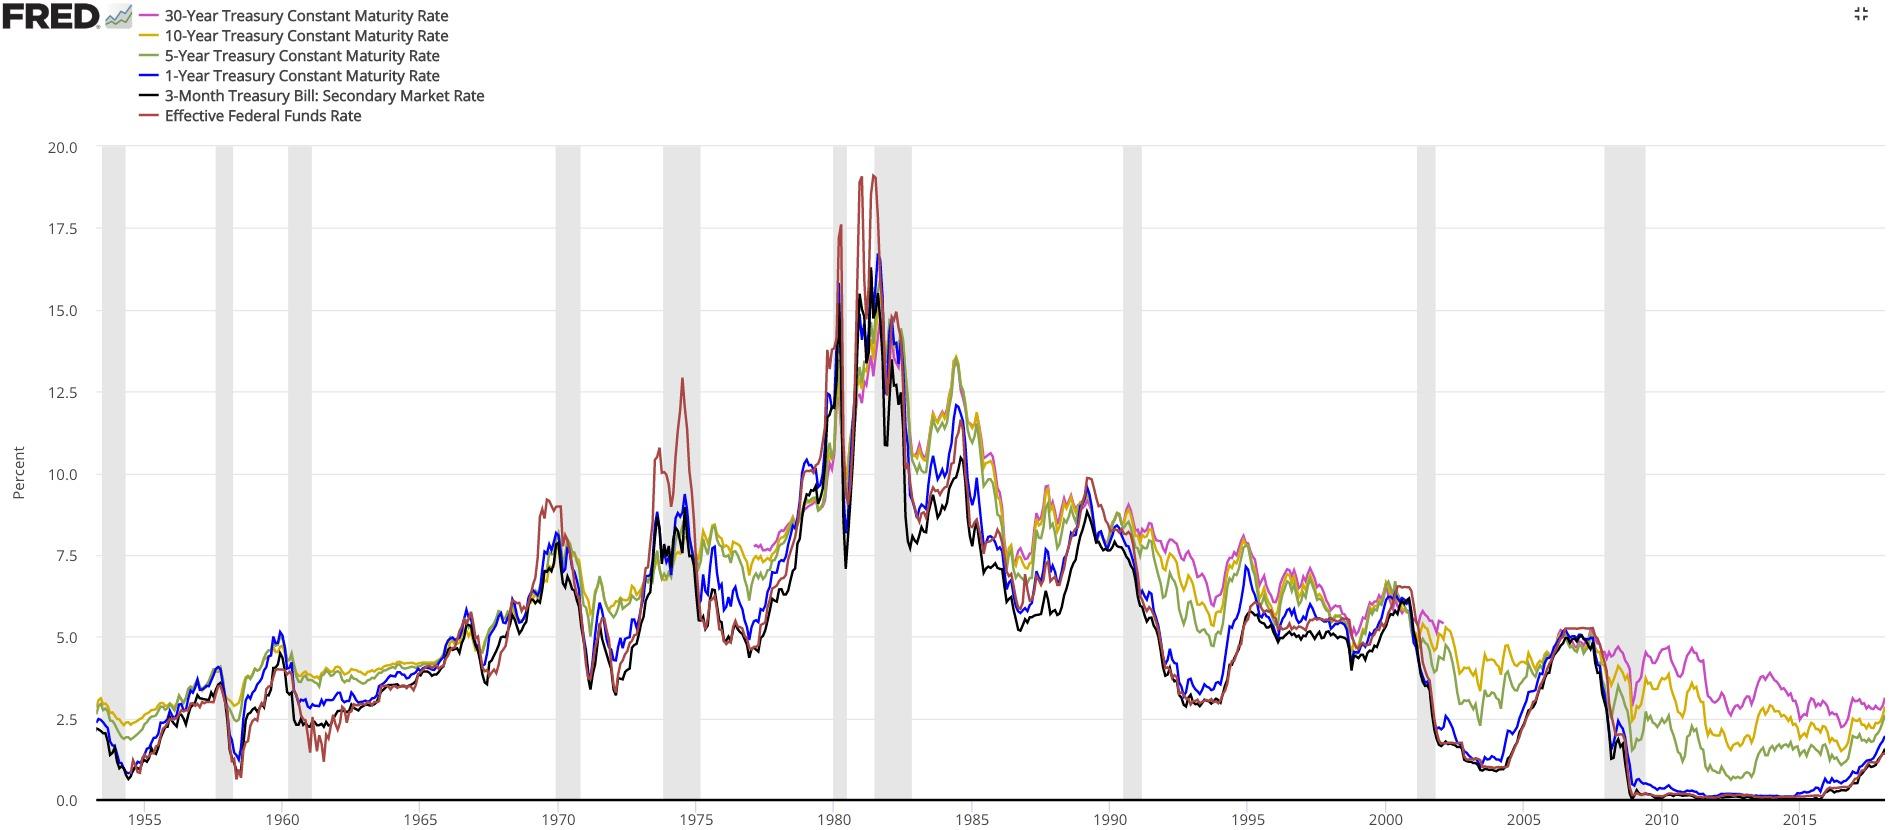 https://upload.wikimedia.org/wikipedia/commons/d/d6/U.S._Treasuries.png